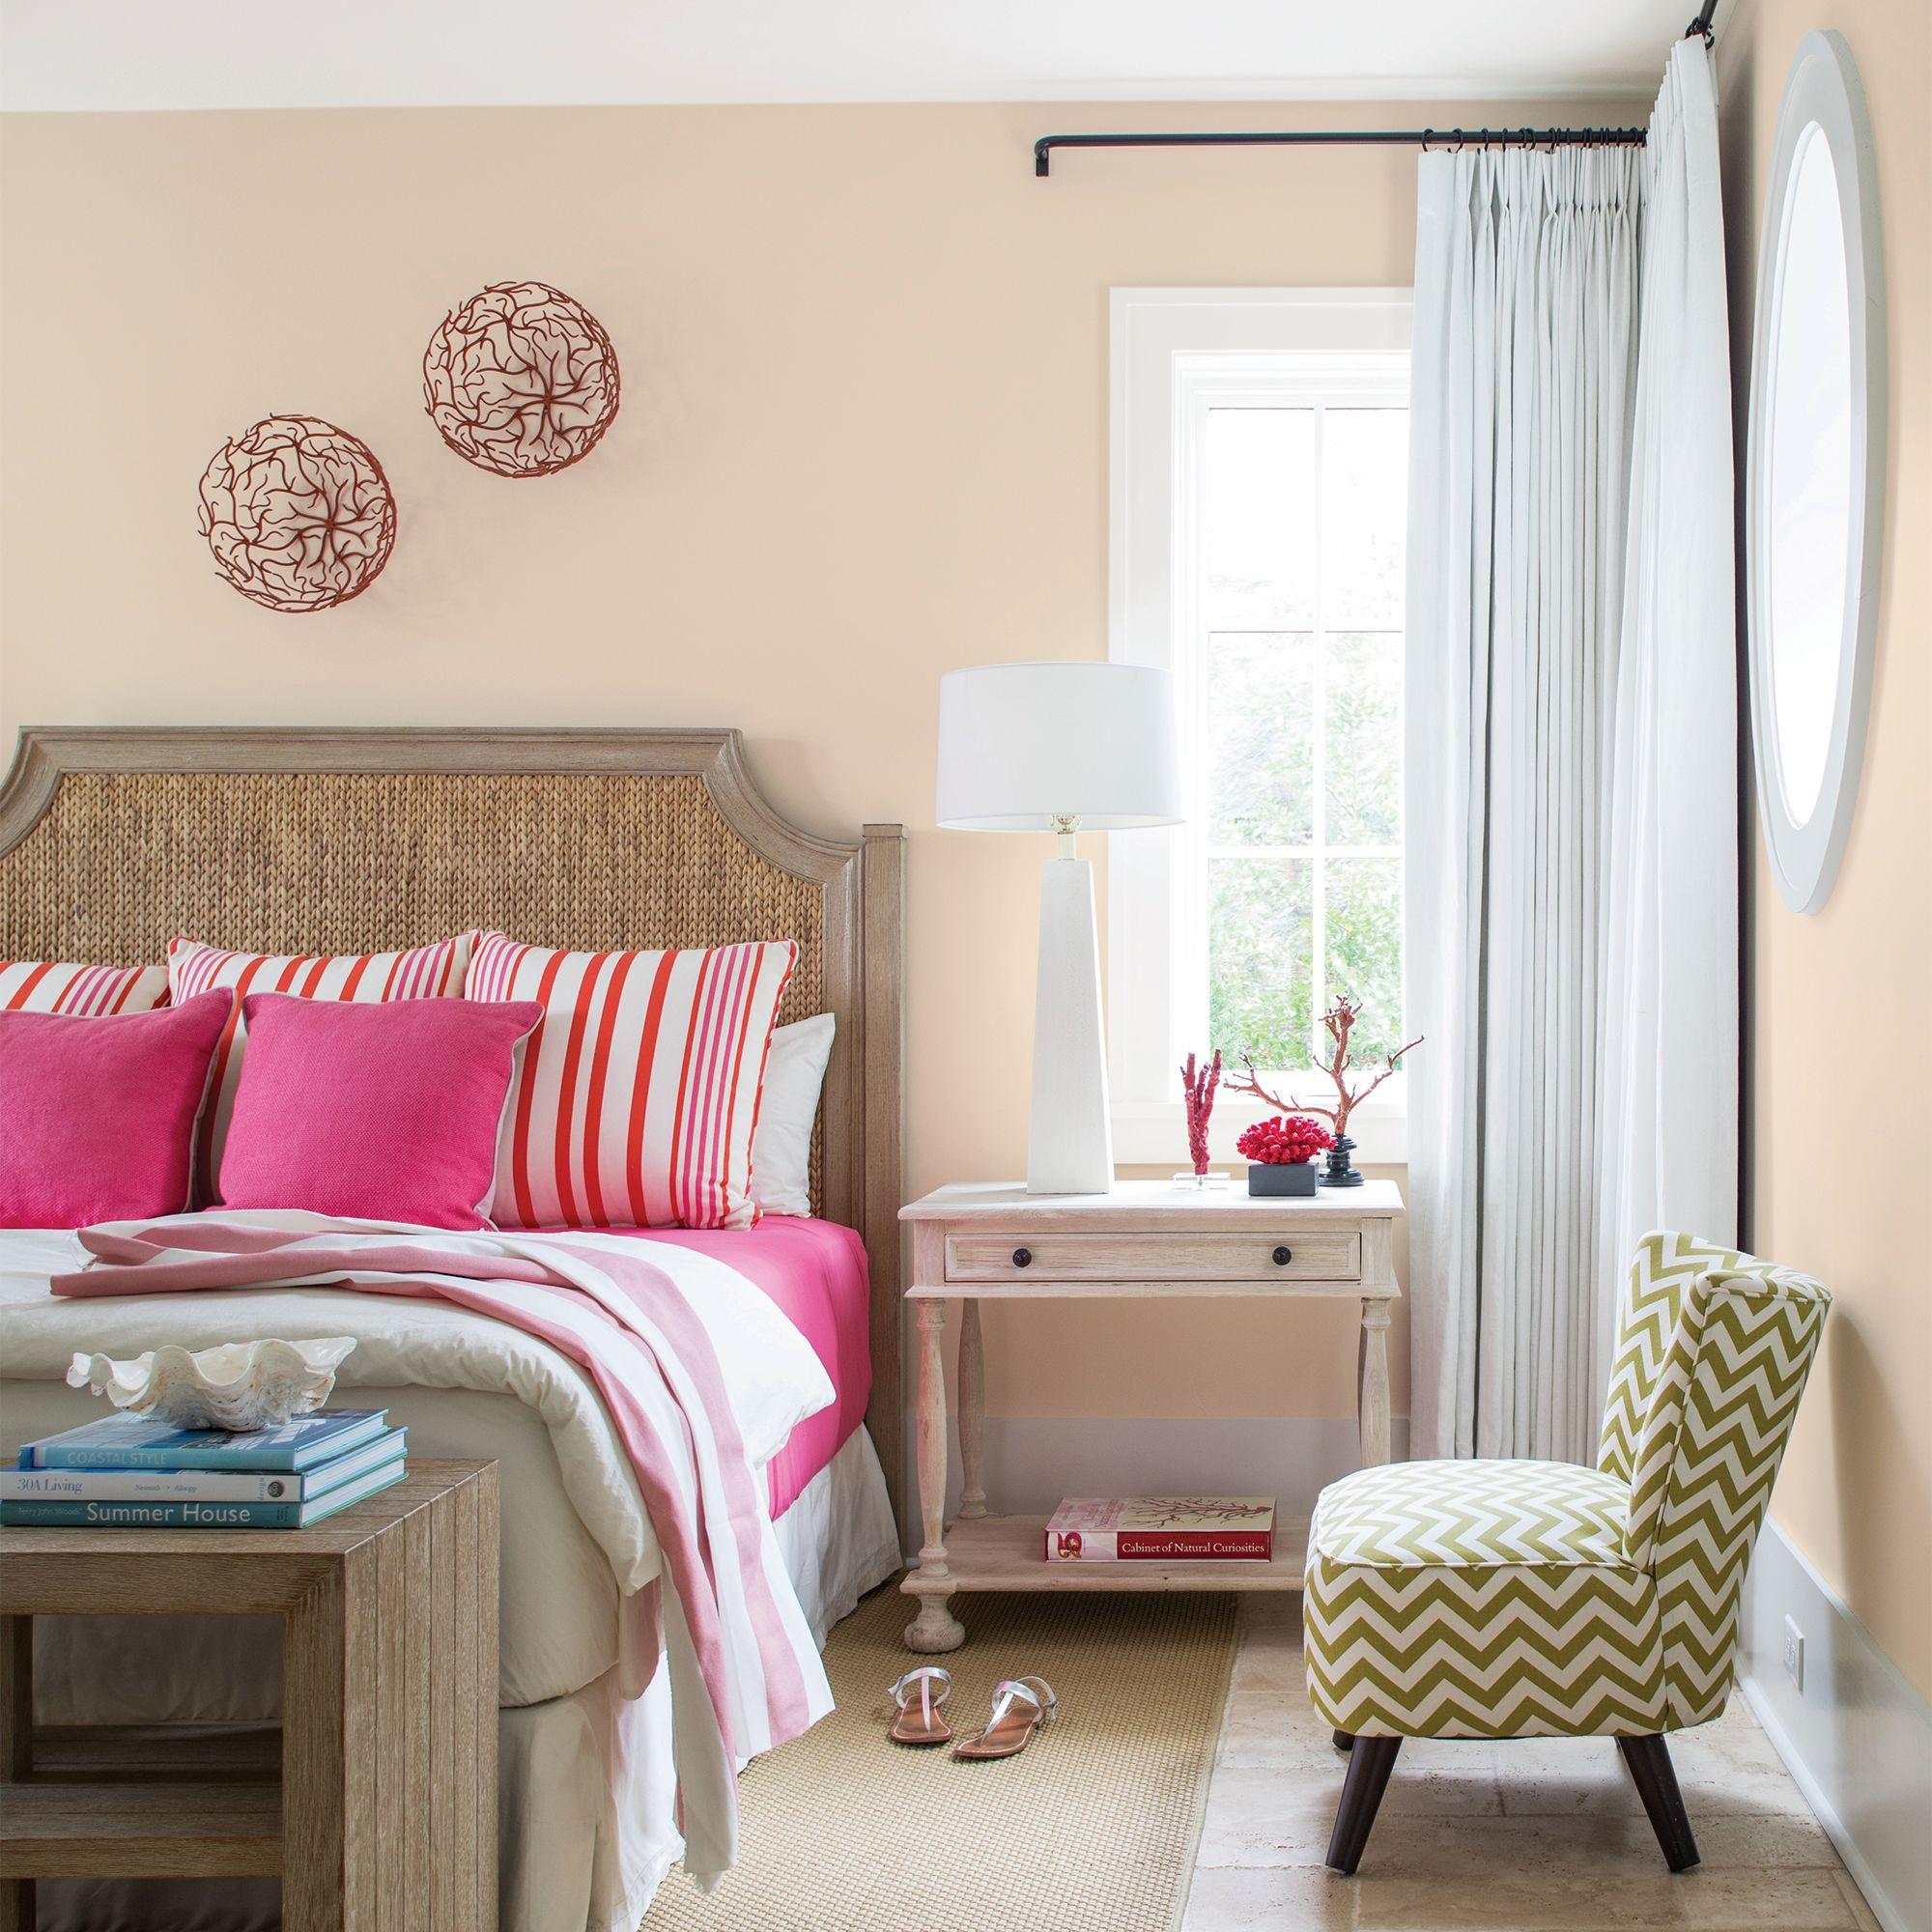 Beige Bedroom with Pink Accents